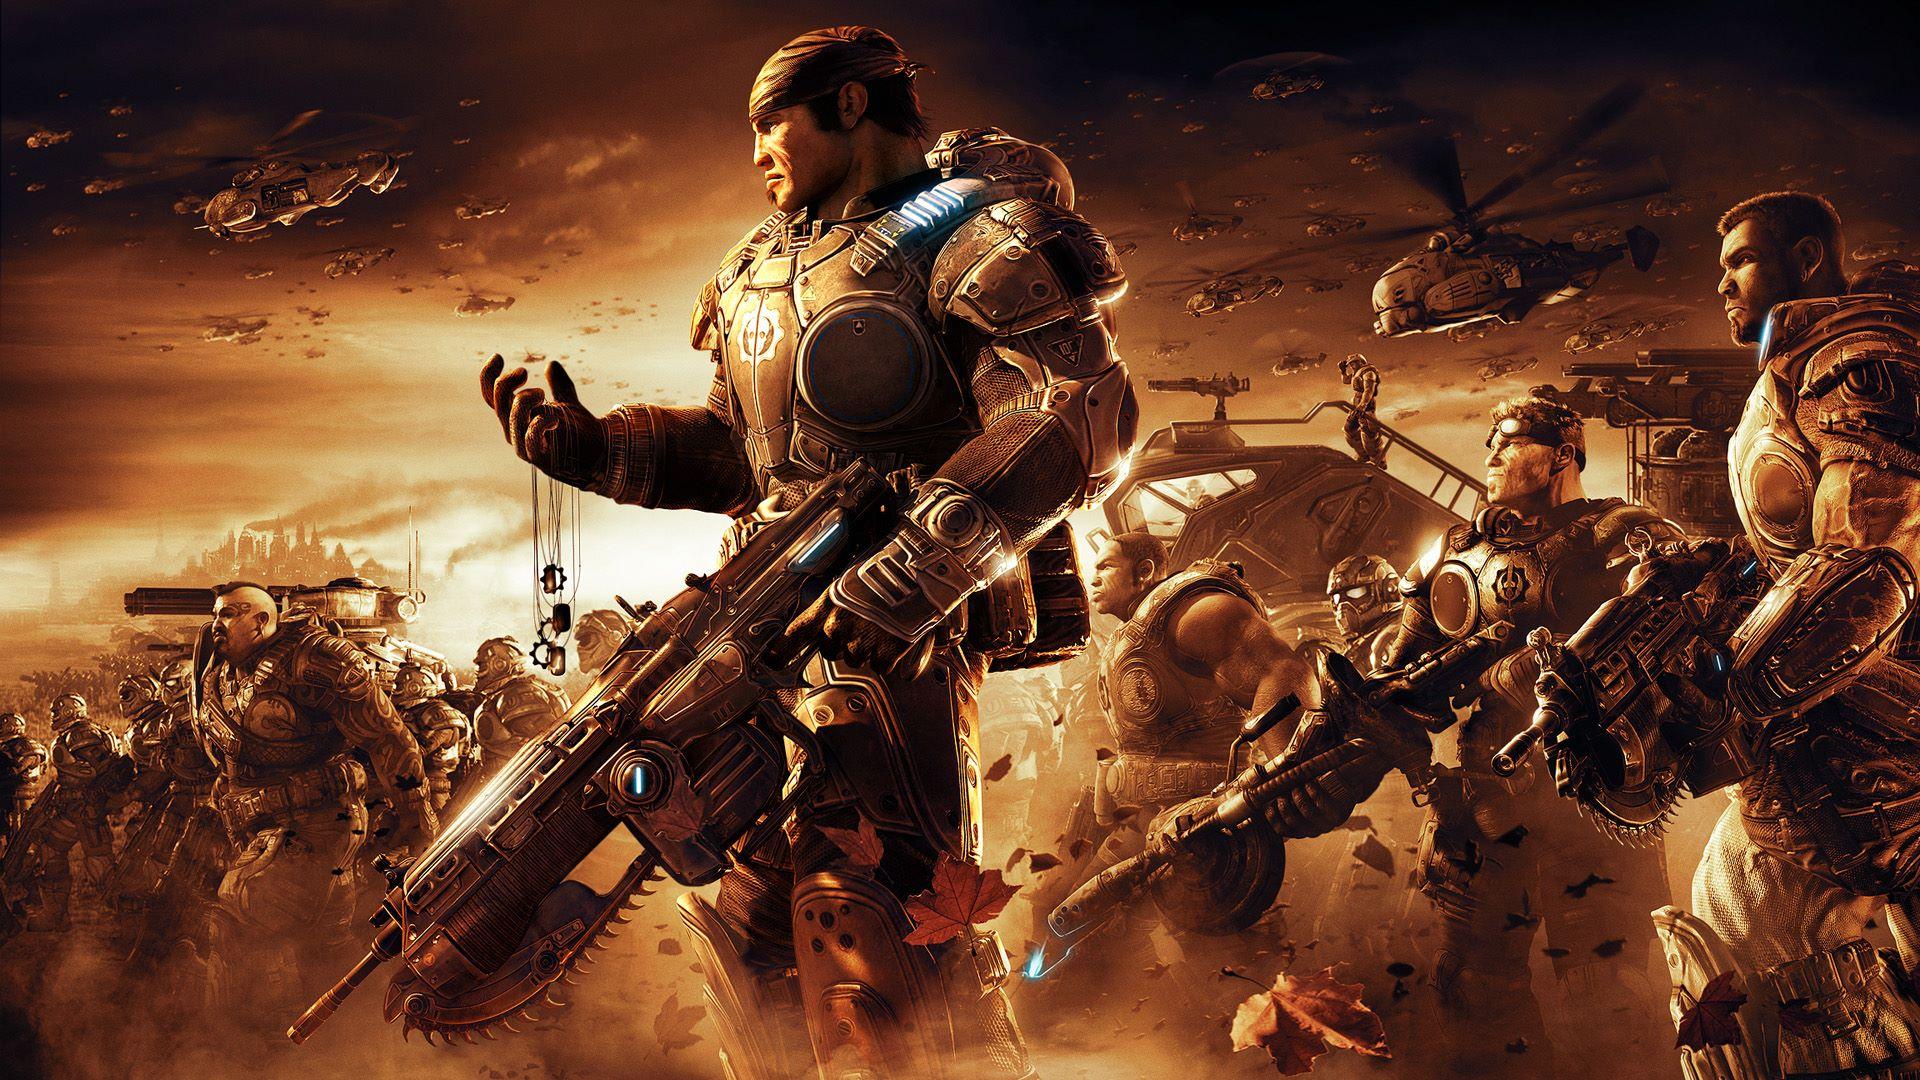 download gears of war 3 pc completo torrent